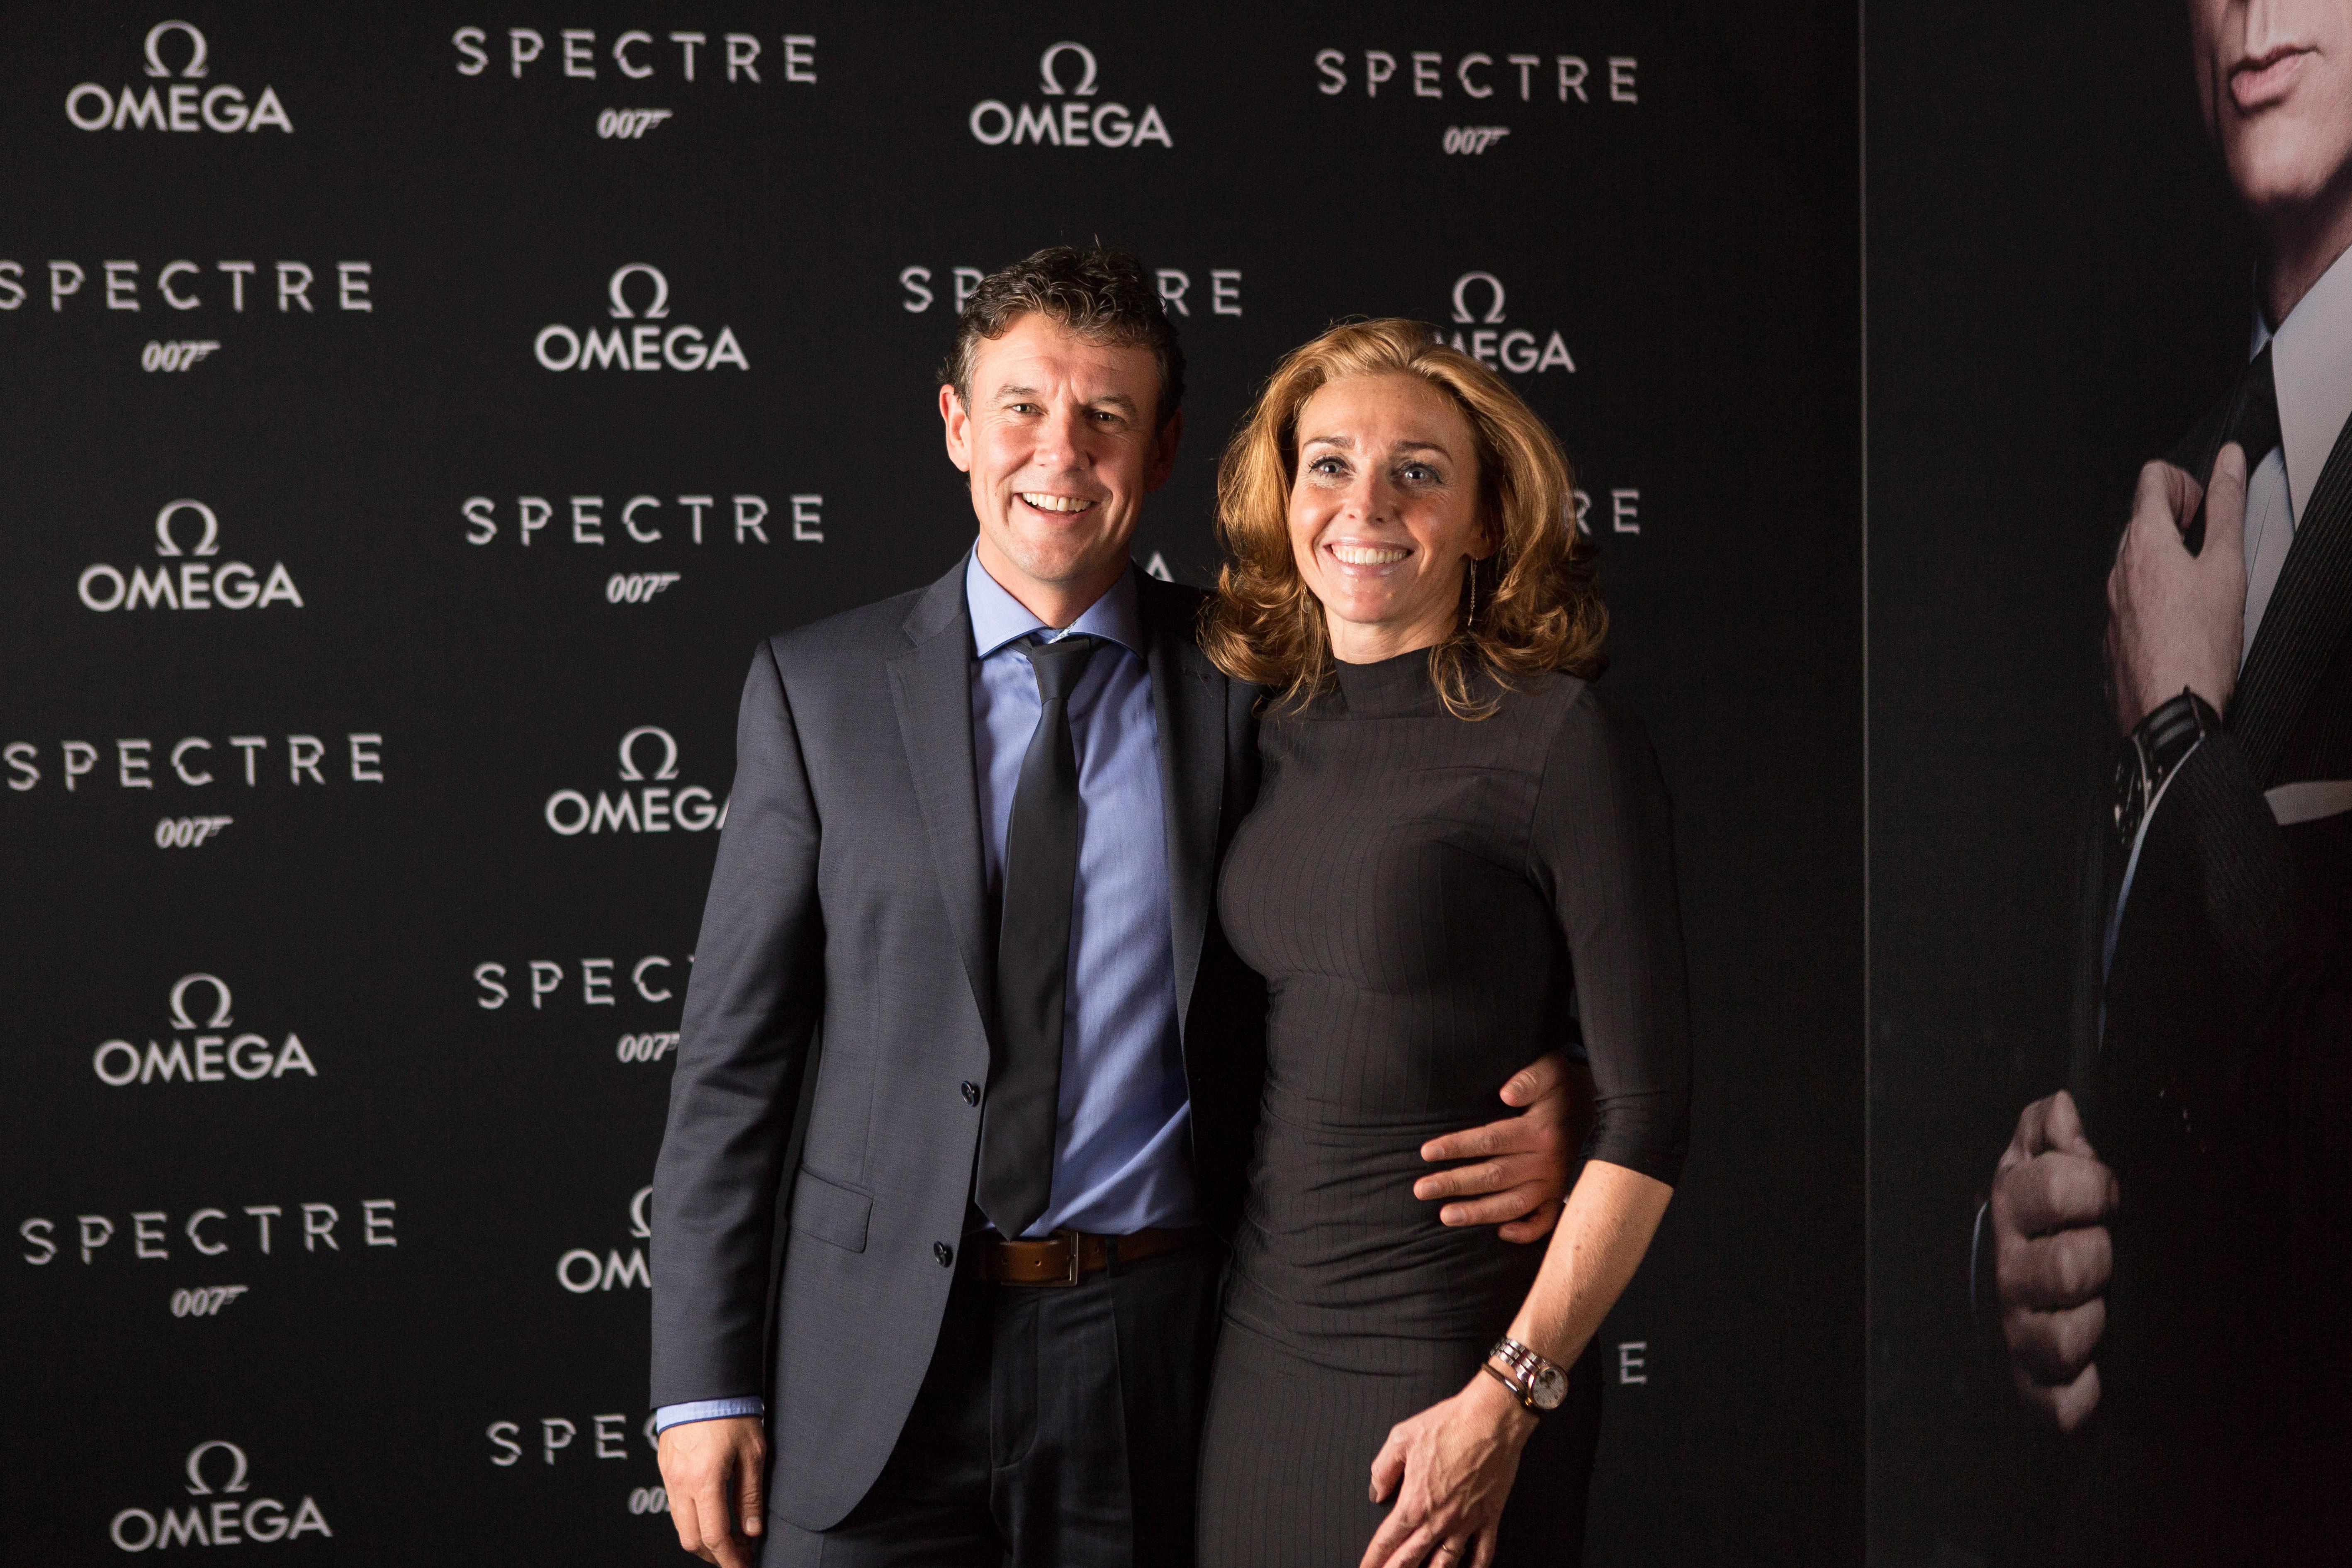 spectre-omega wall-45